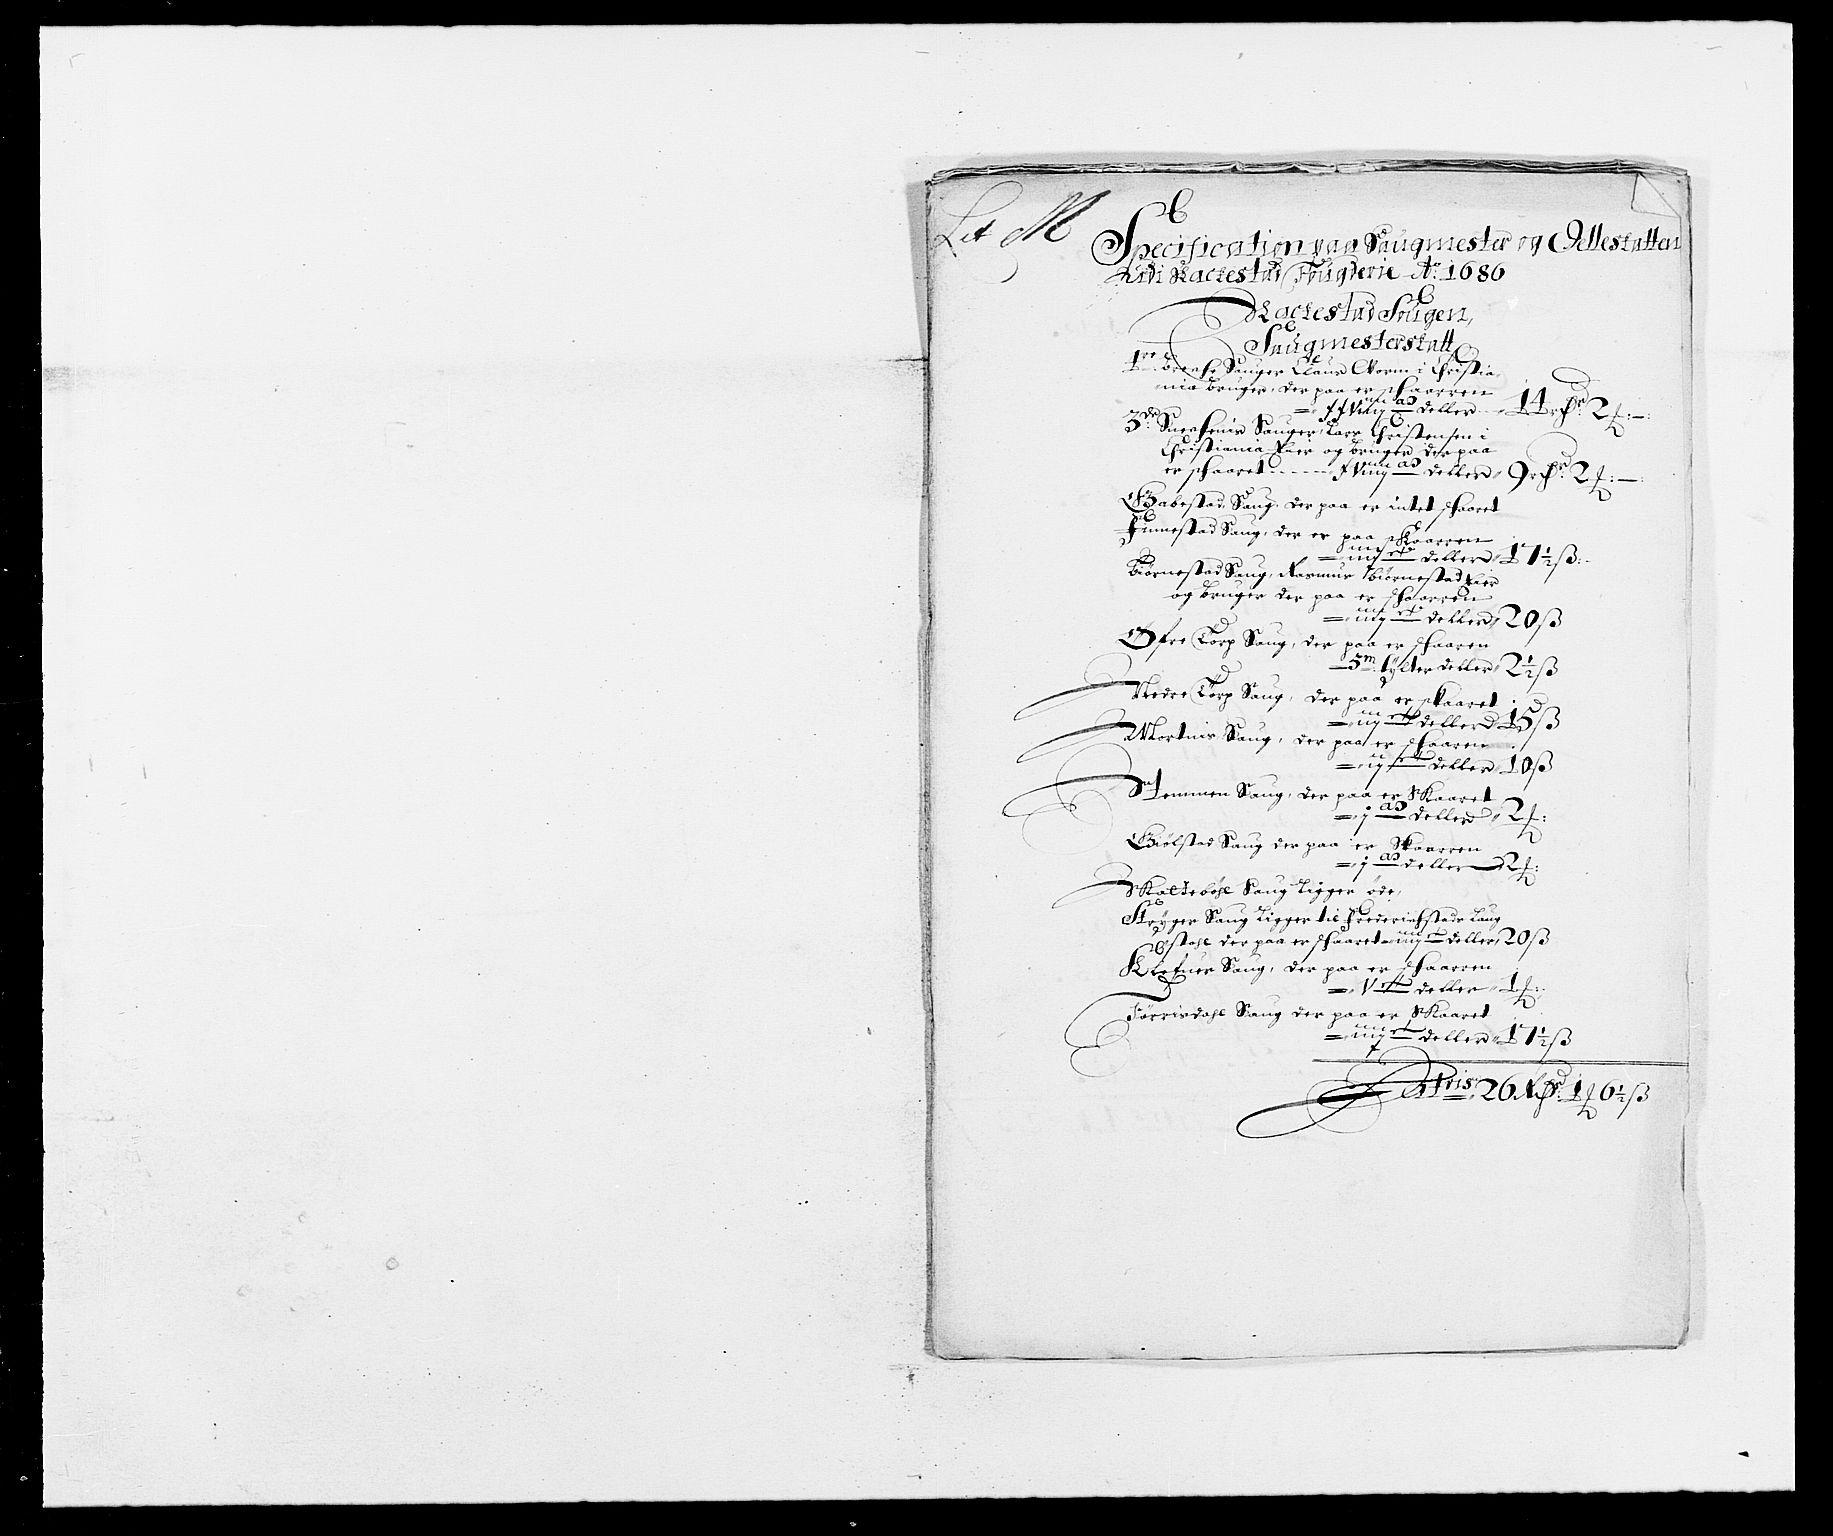 RA, Rentekammeret inntil 1814, Reviderte regnskaper, Fogderegnskap, R05/L0275: Fogderegnskap Rakkestad, 1685-1686, s. 267